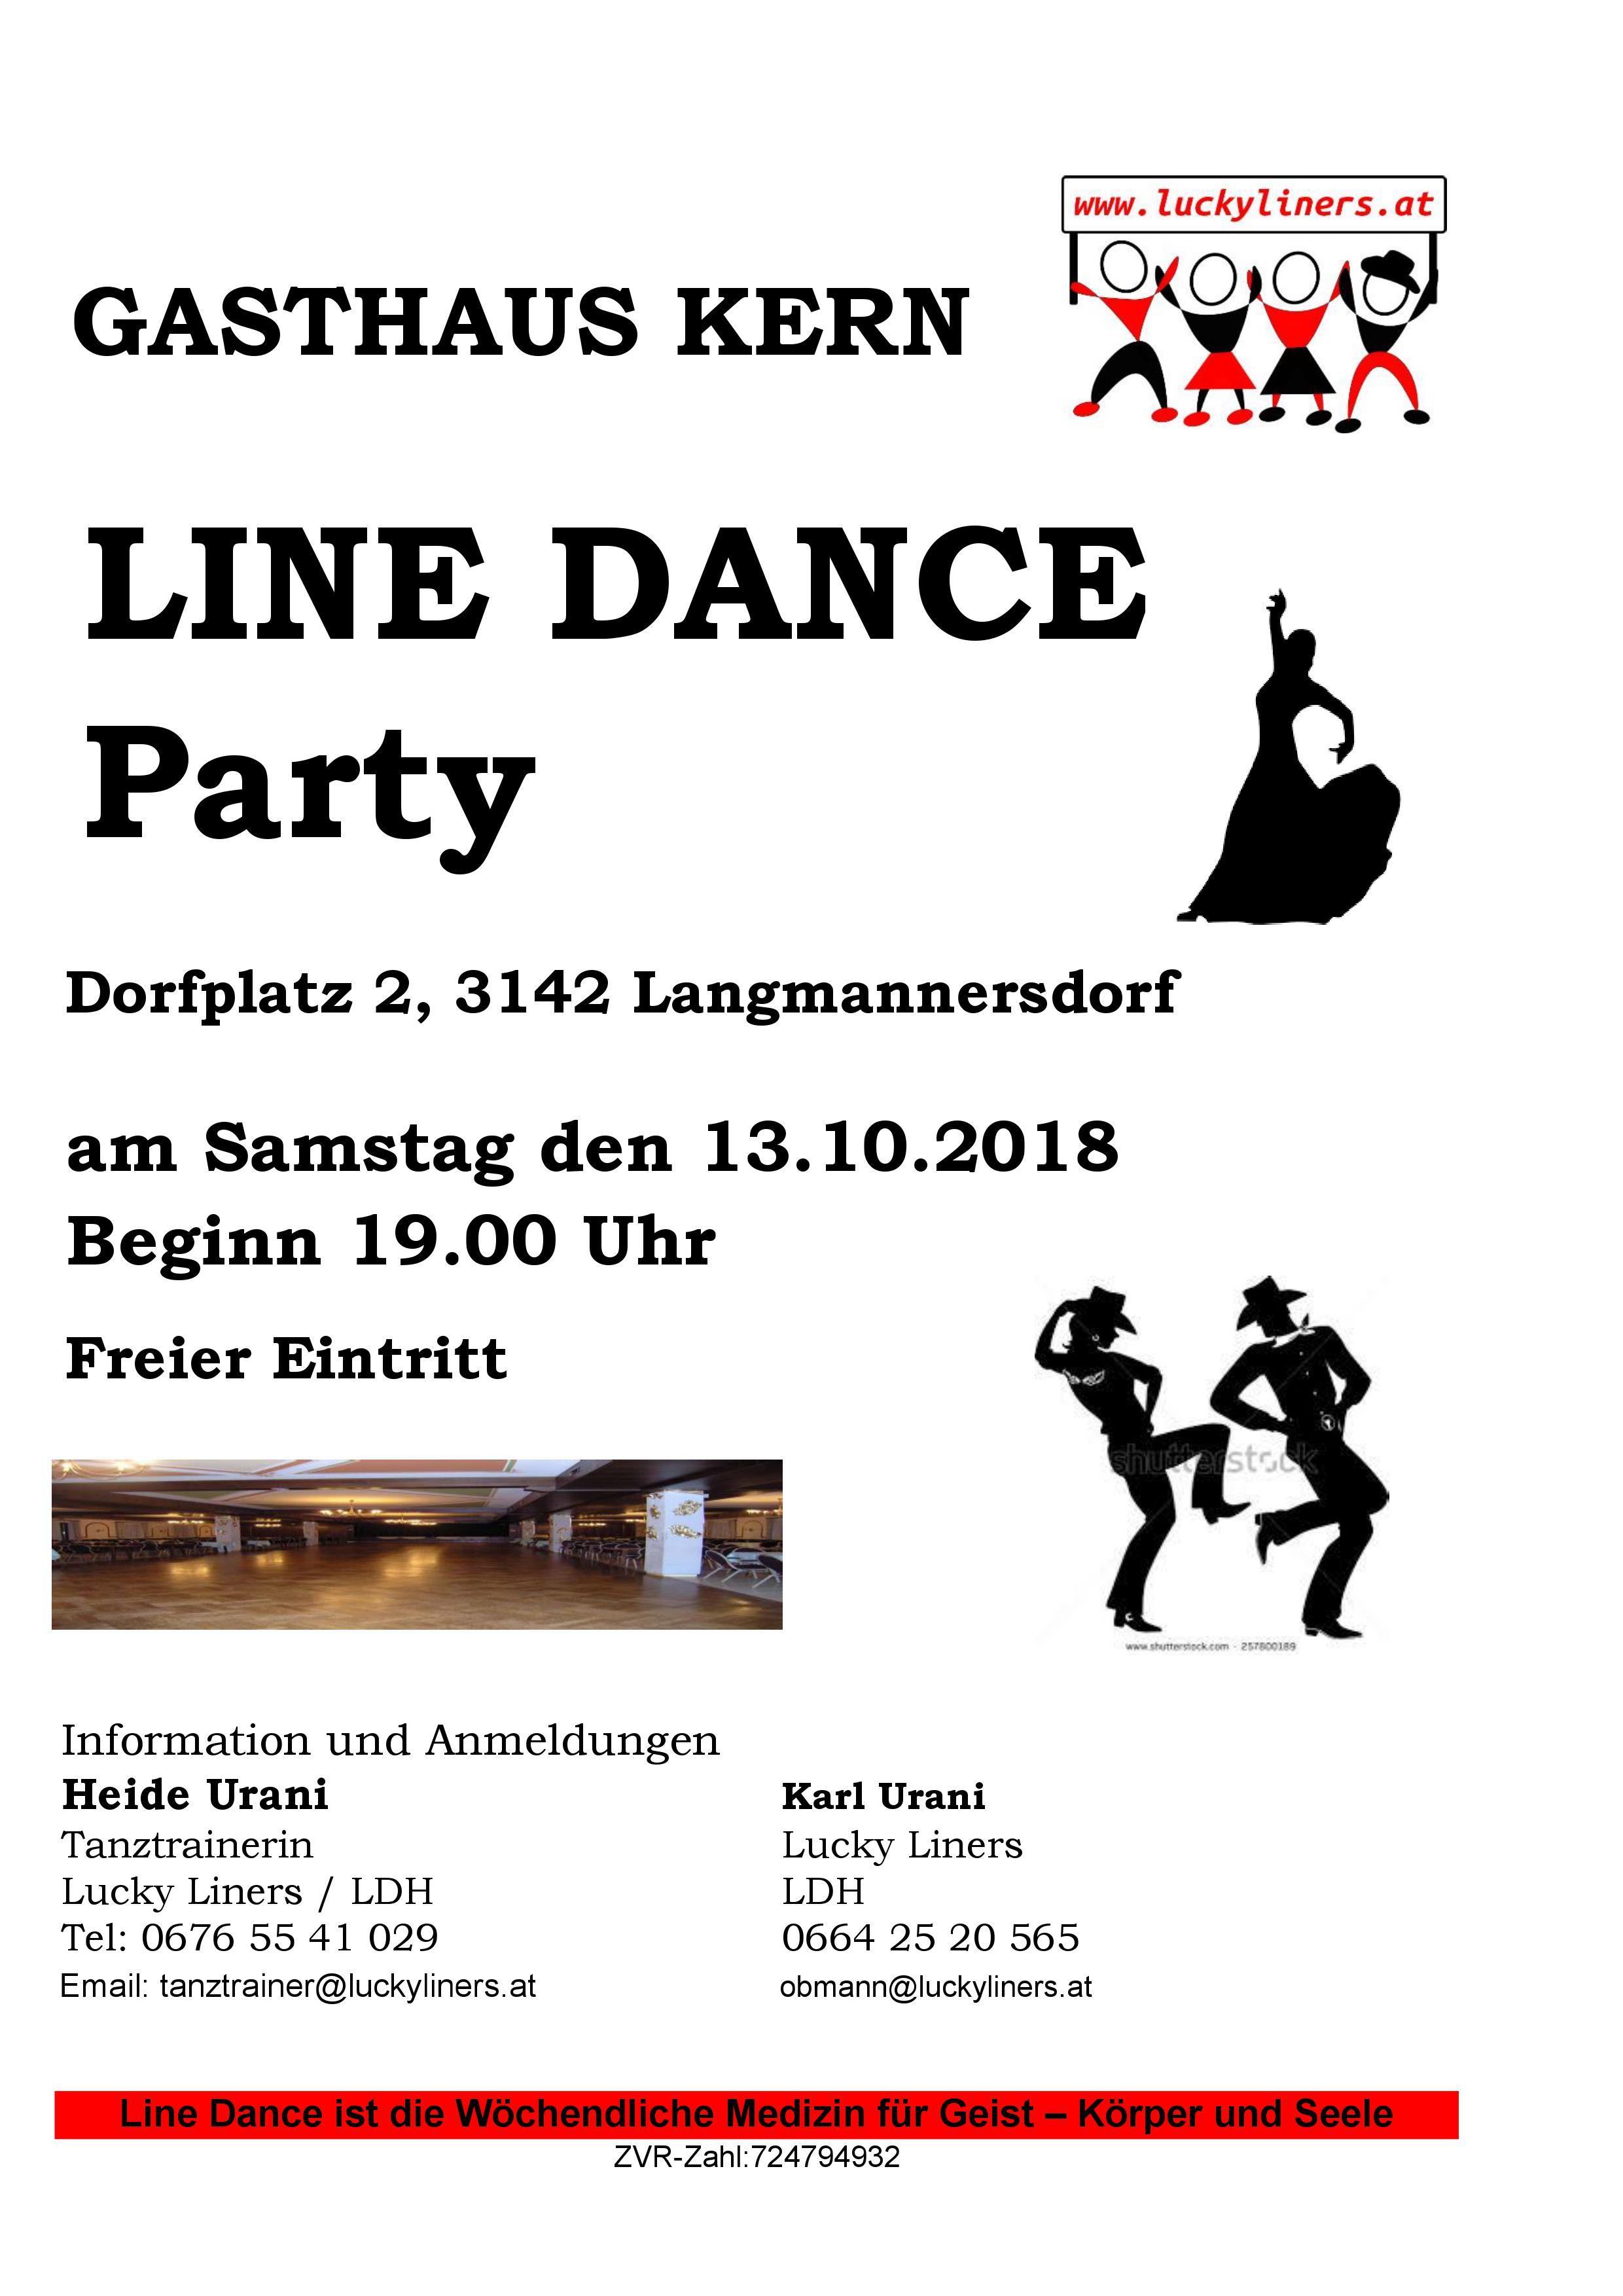 LD Party Kern 13102018